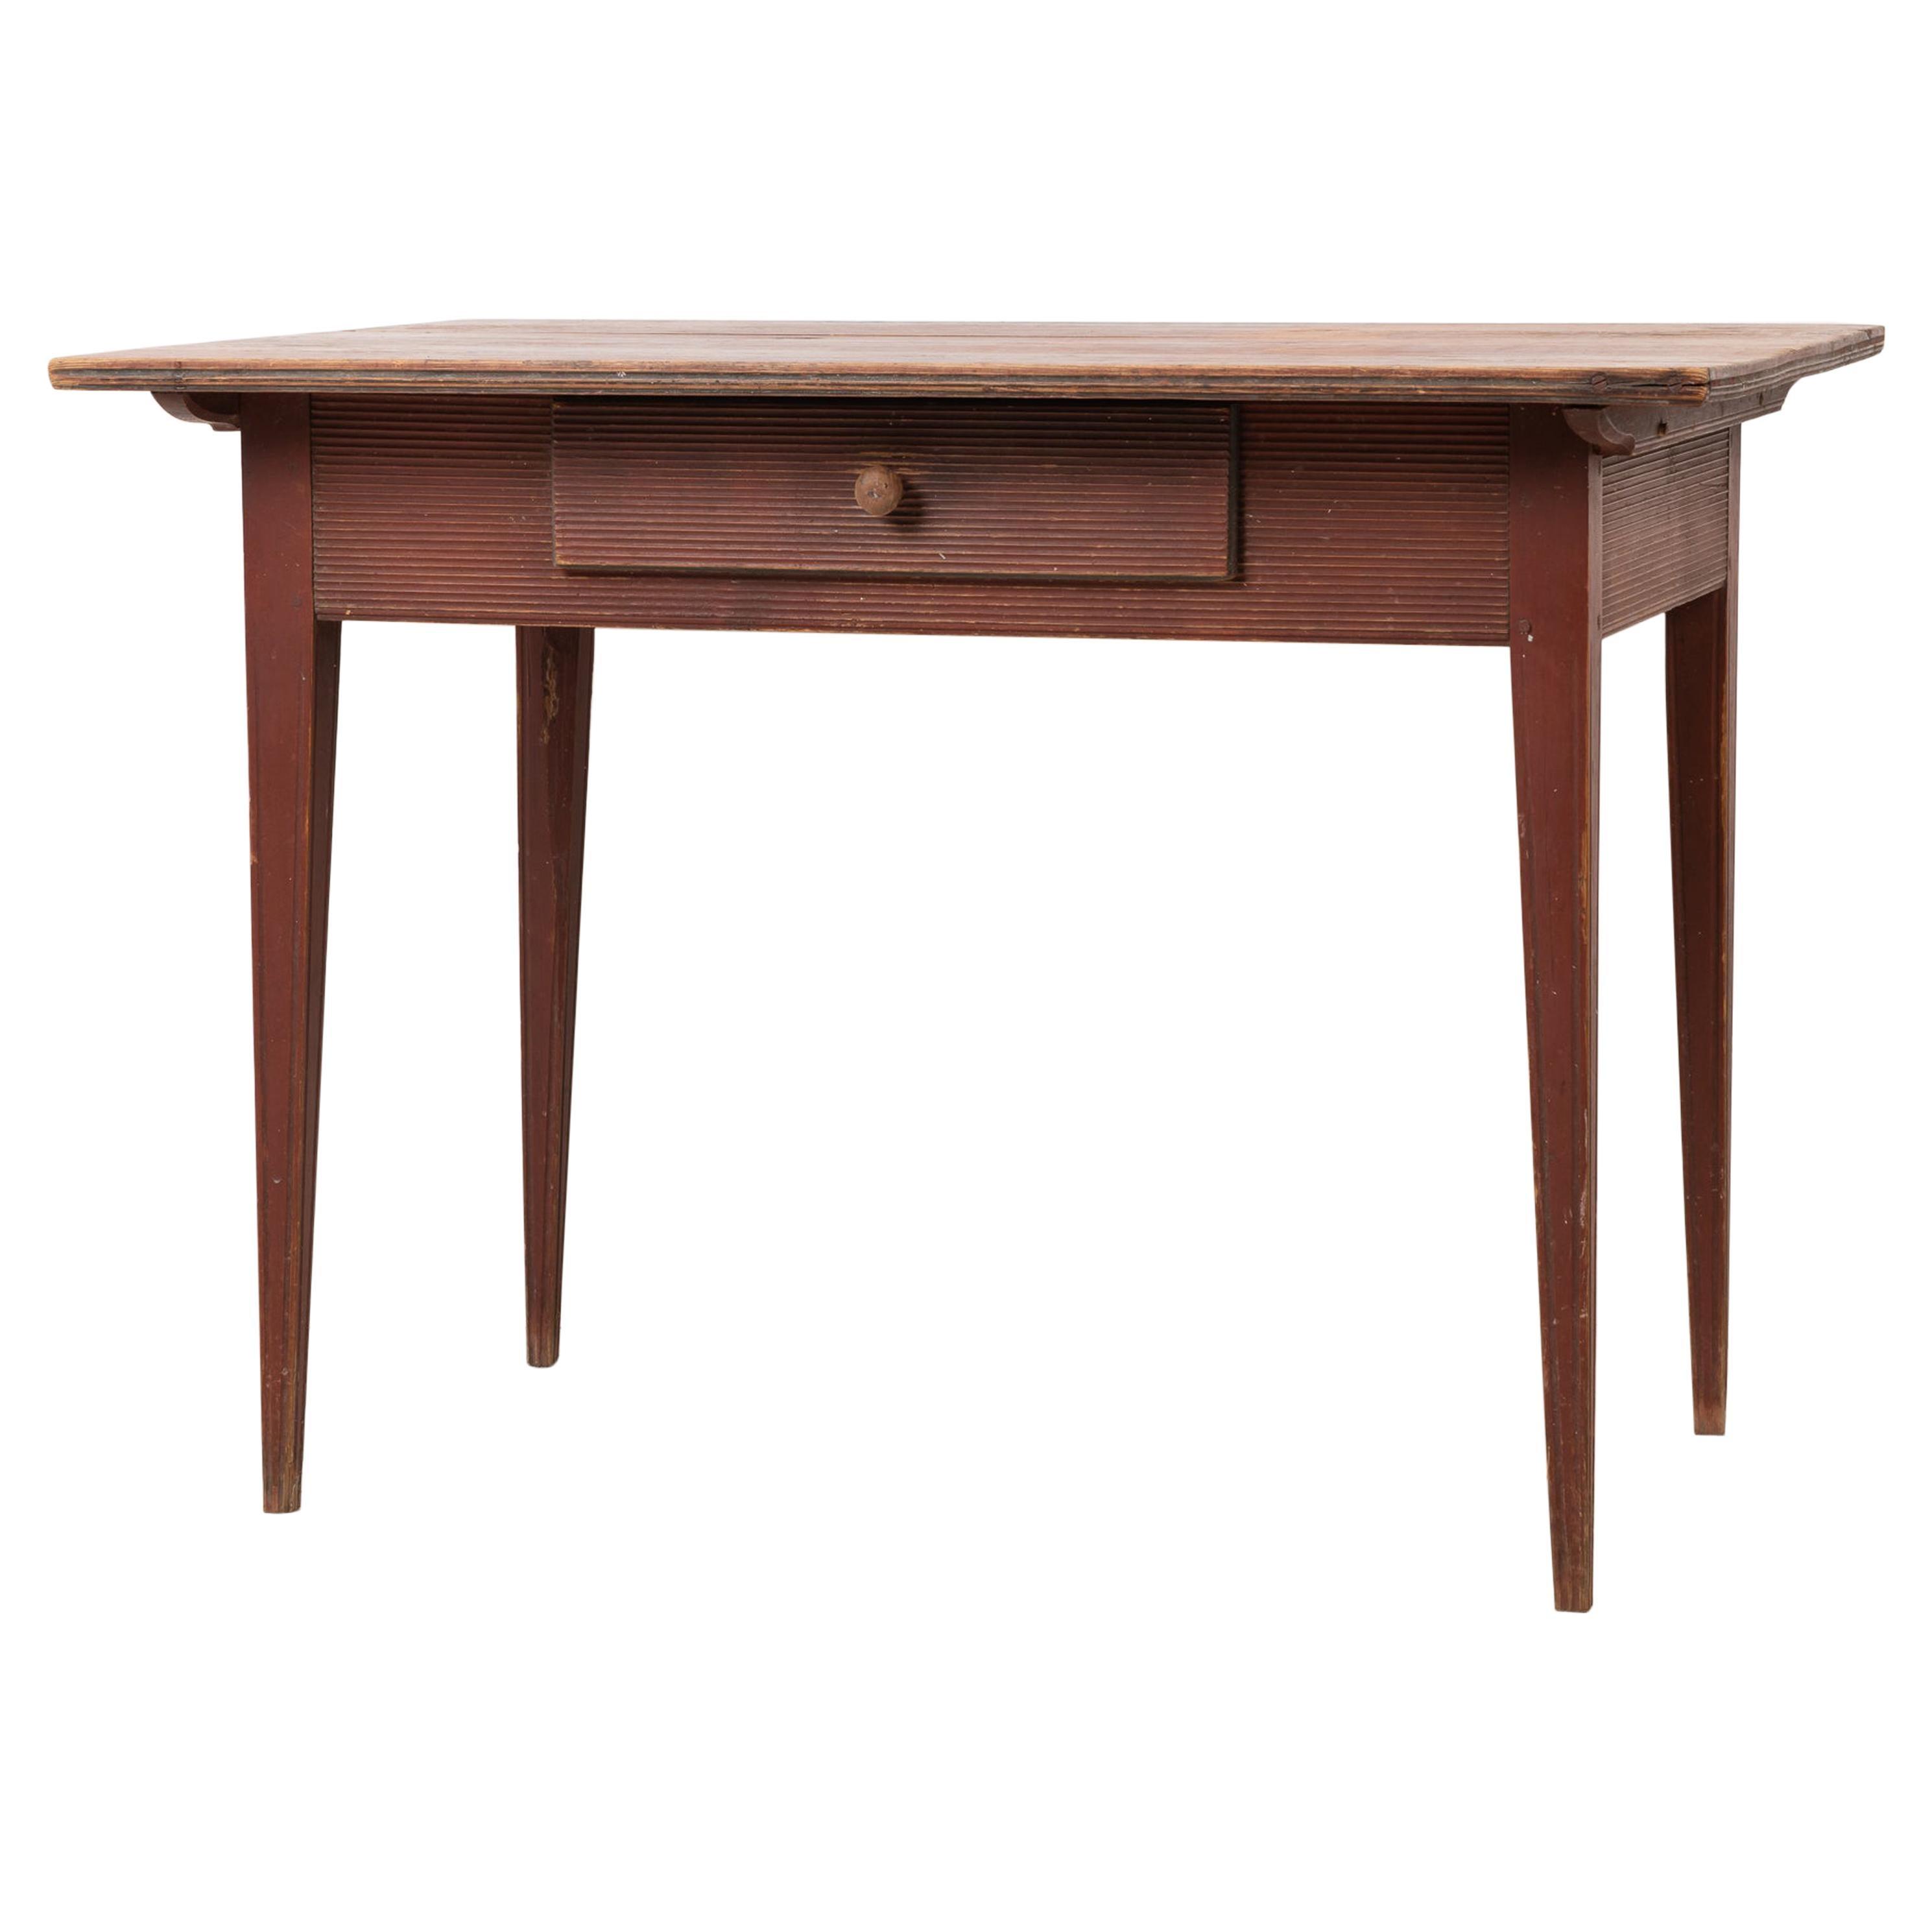 Late 18th Century Original Neoclassical Table